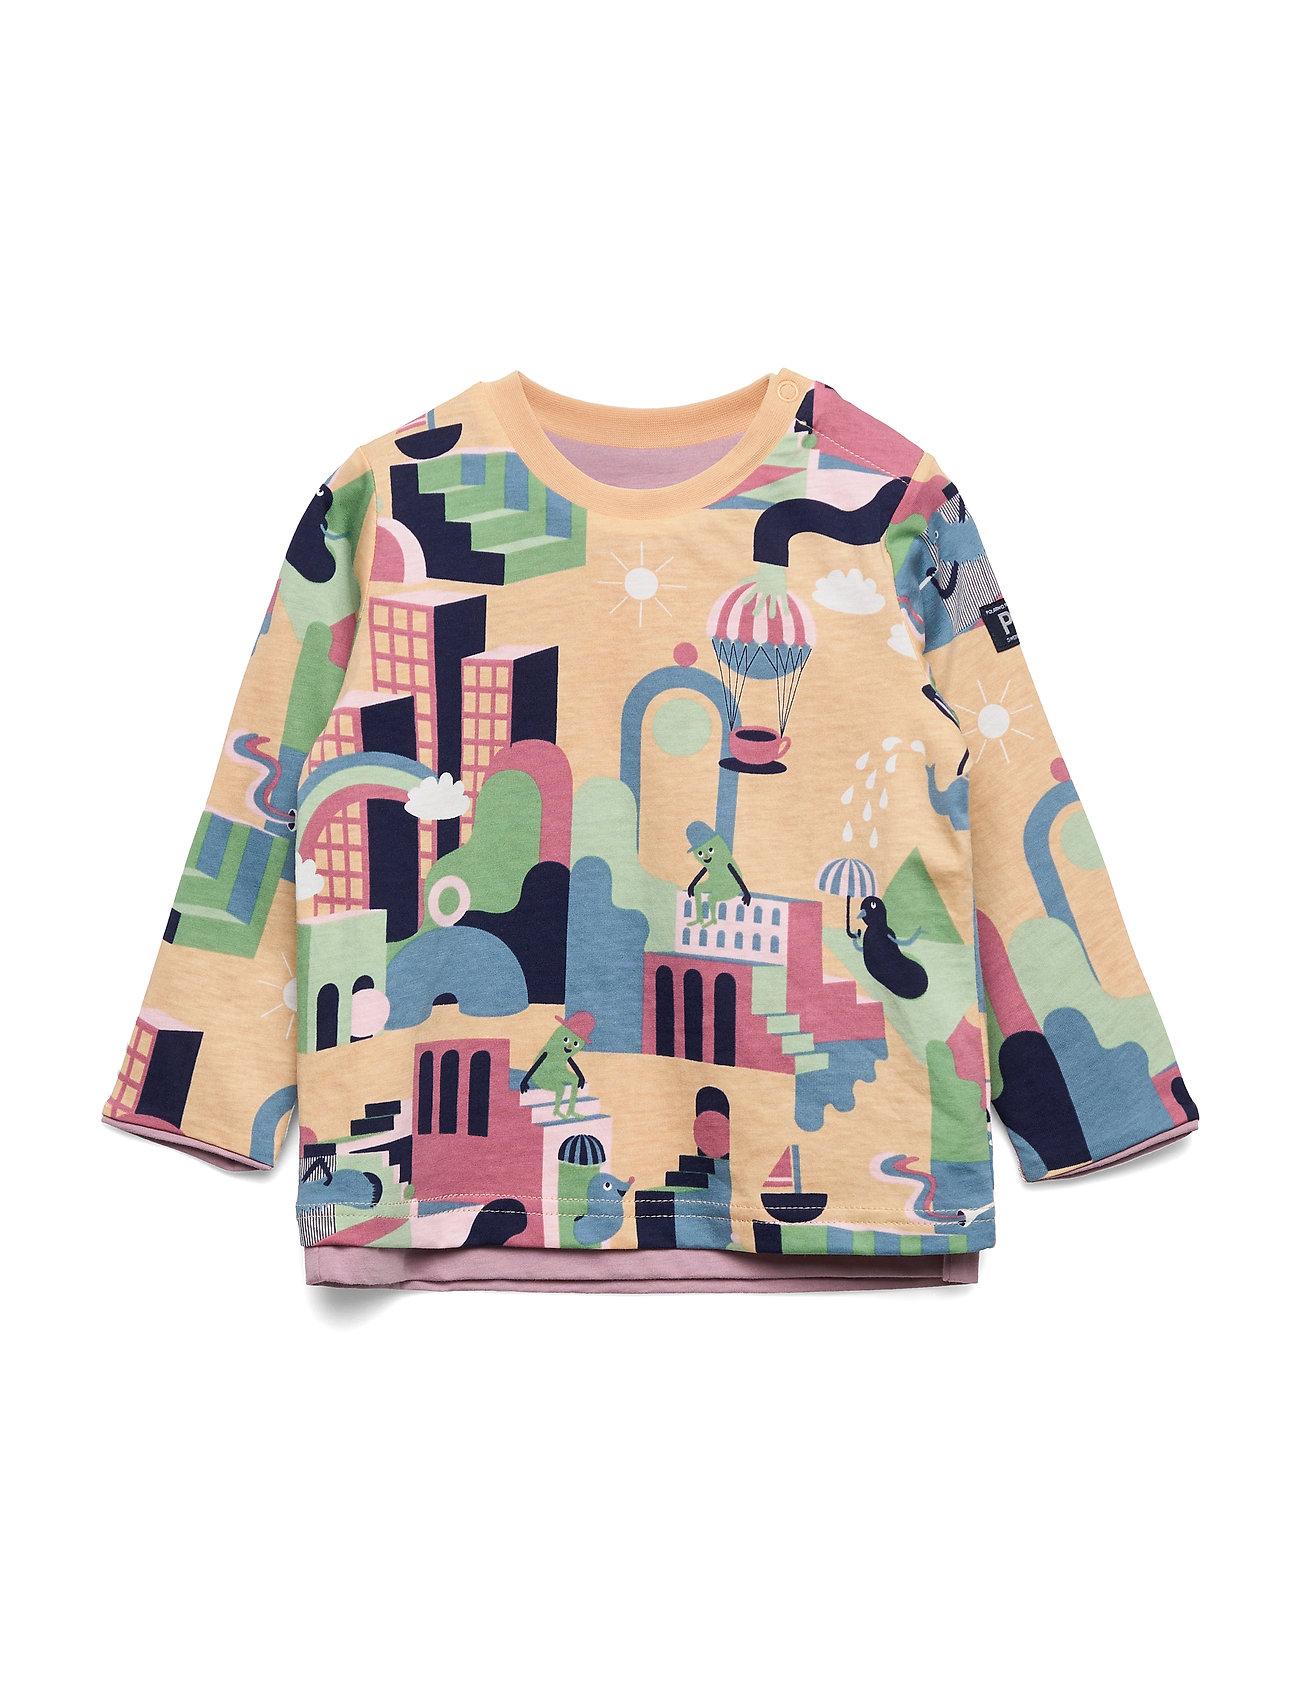 Image of T-Shirt L/S Print Preschool Langærmet T-shirt Lyserød Polarn O. Pyret (3336494735)